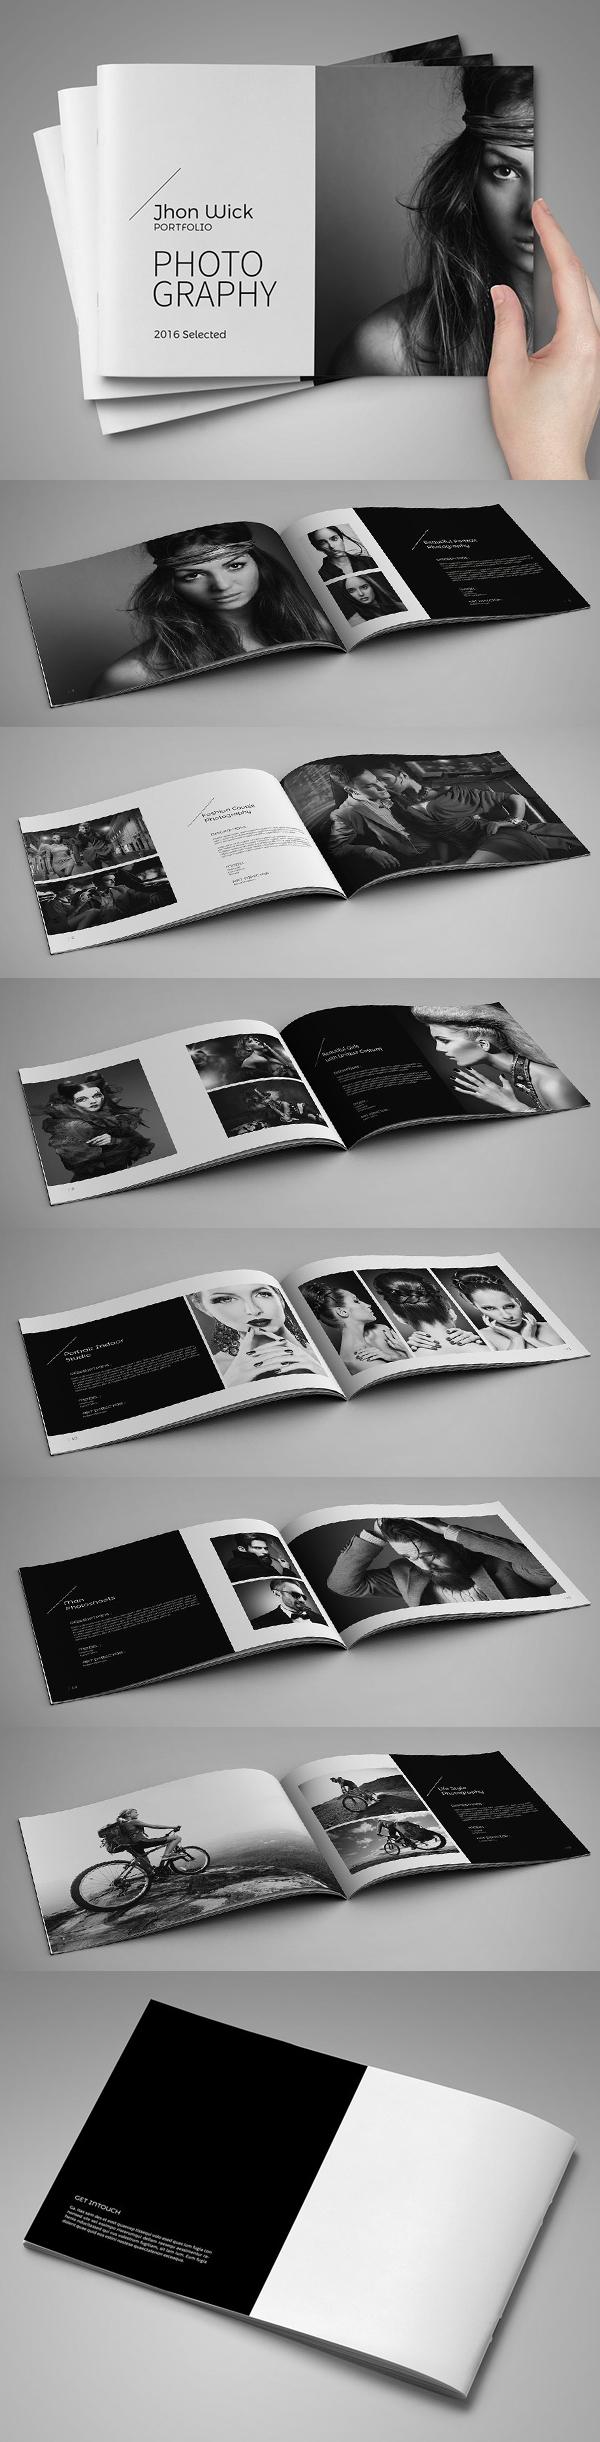 100 Professional Corporate Brochure Templates - 29